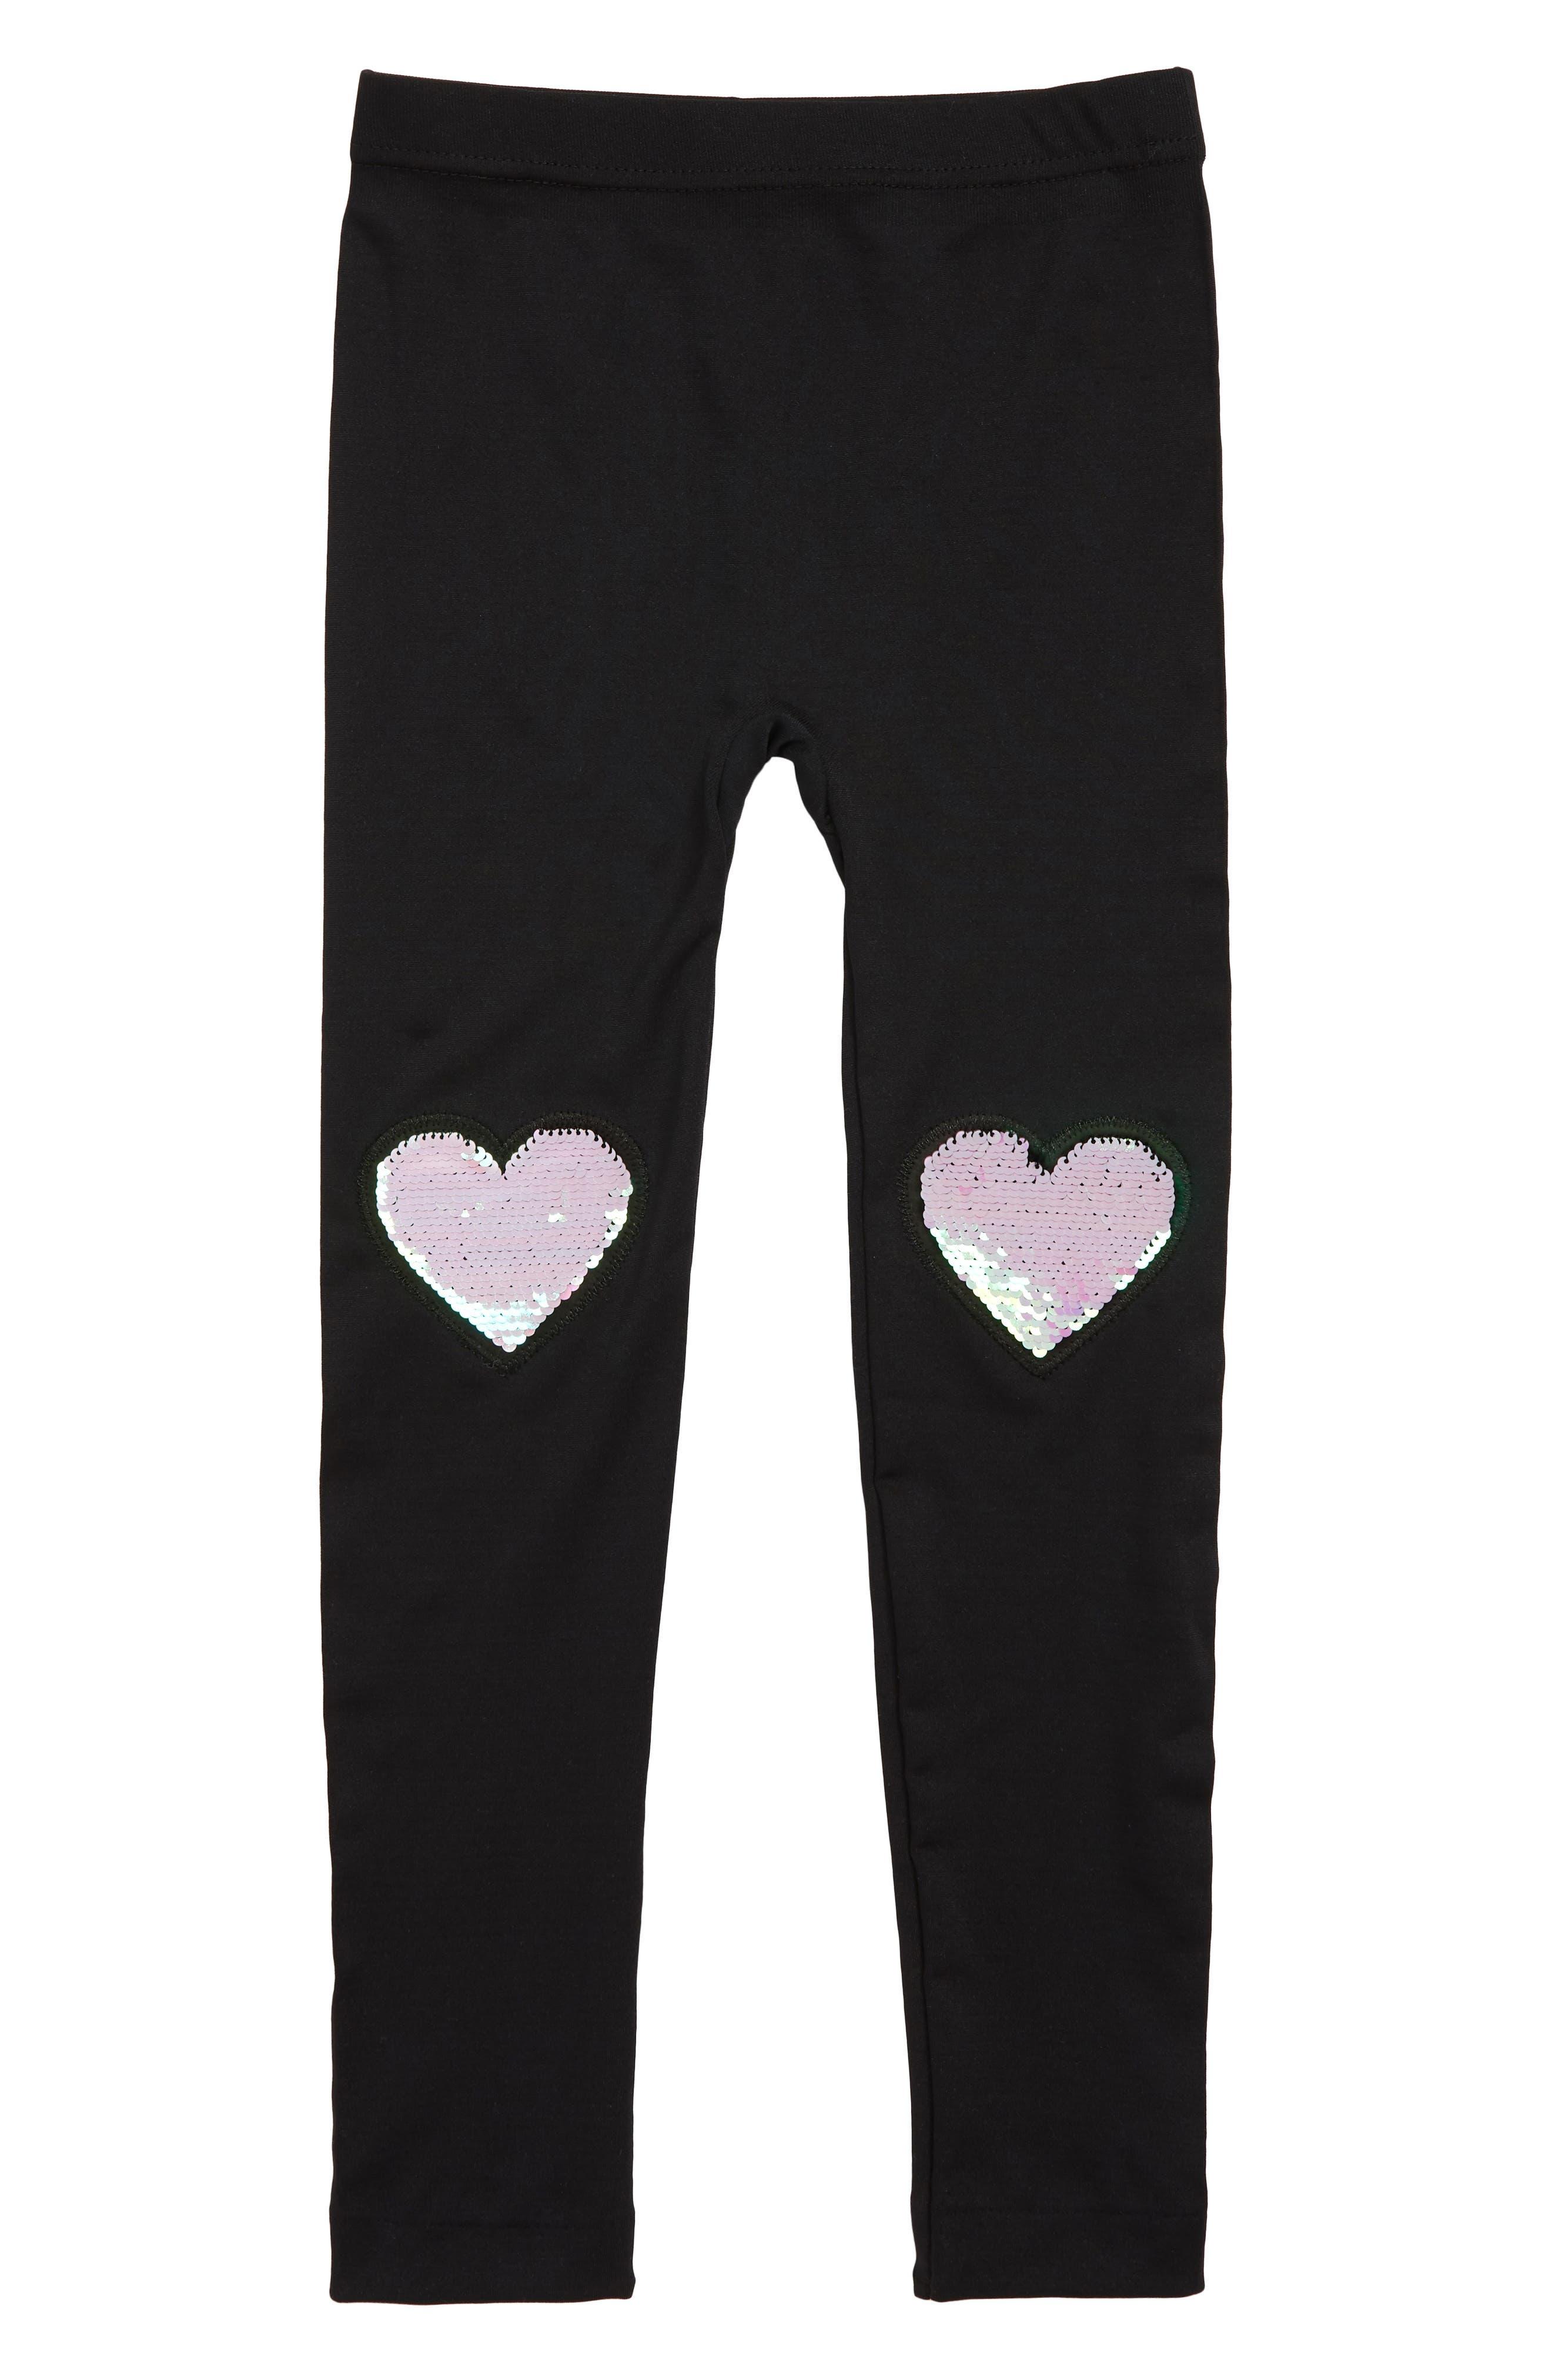 CAPELLI NEW YORK, Hearts Reversible Sequin Leggings, Main thumbnail 1, color, BLACK